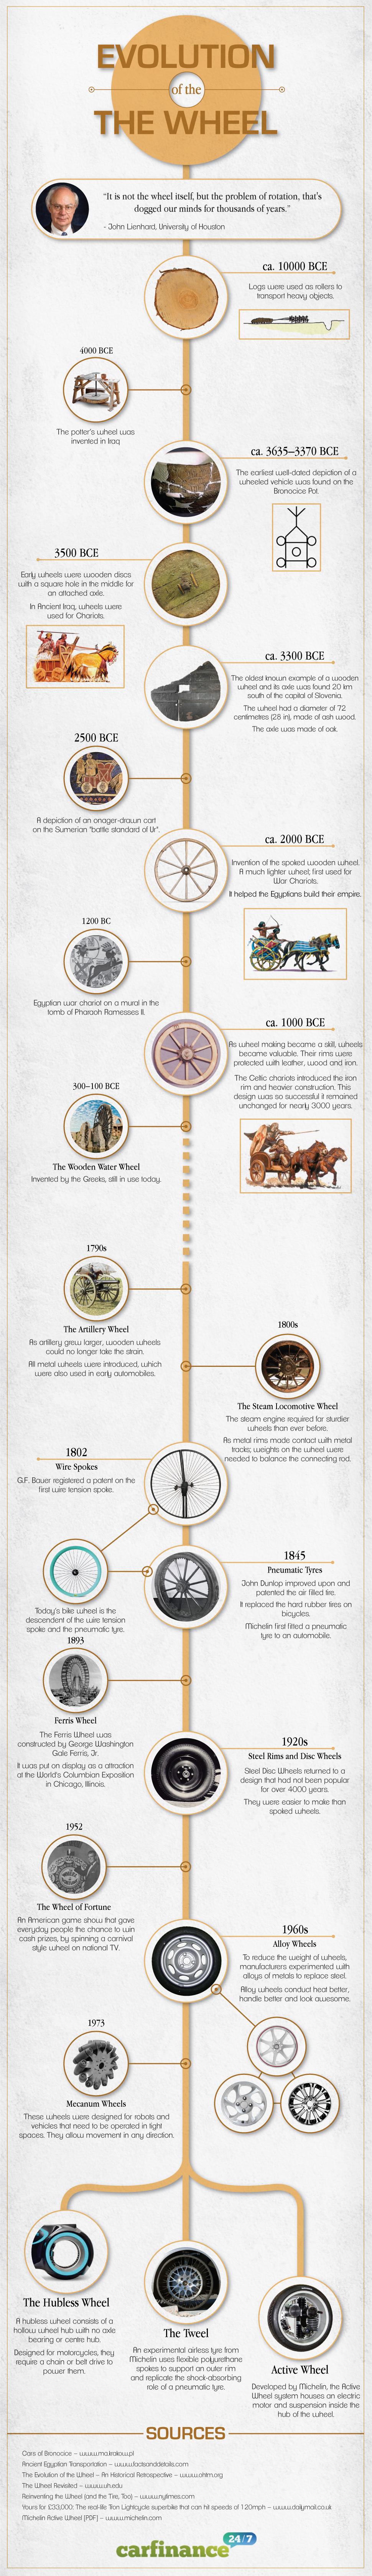 evolution-of-the-wheel